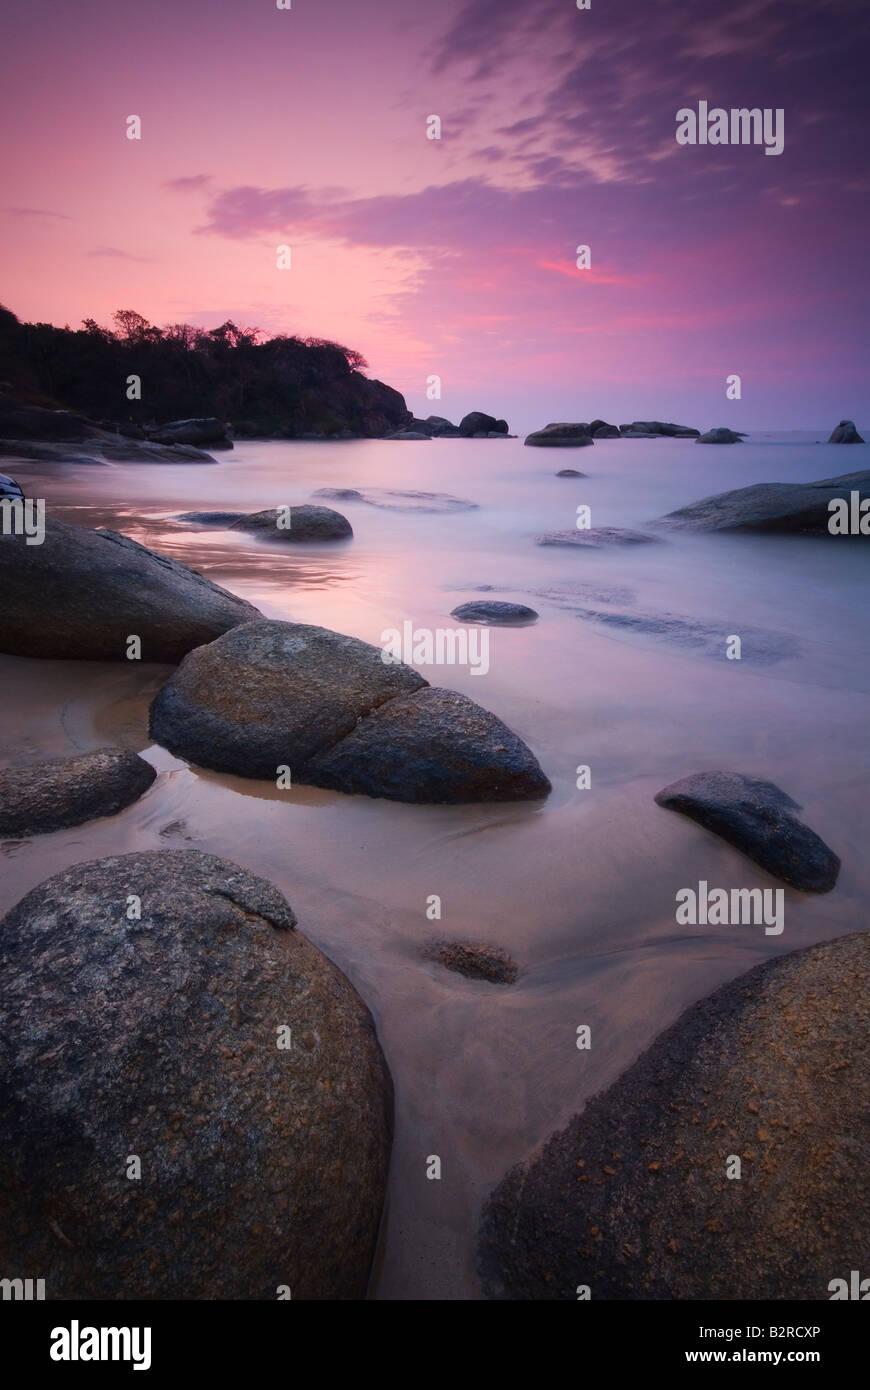 Sunset at Agonda Beach, South Goa, India, Subcontinent, Asia - Stock Image